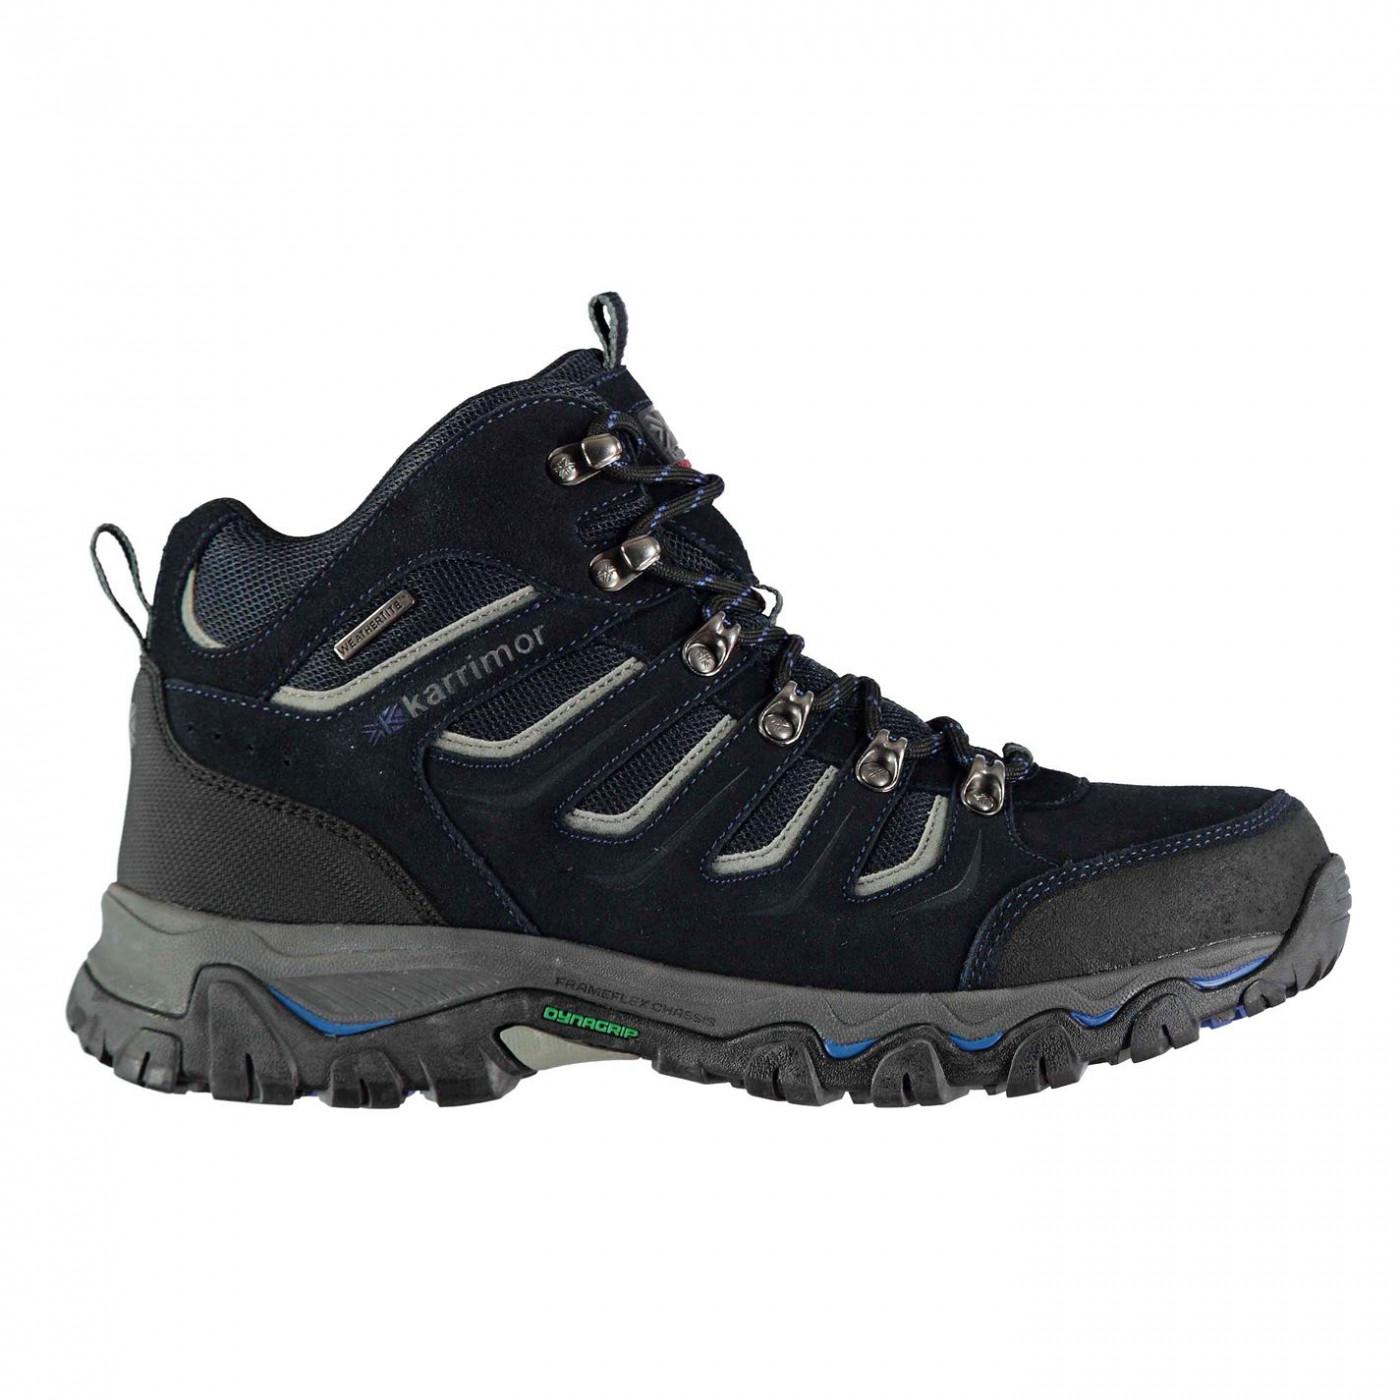 Men's walking shoes Karrimor Mount Mid